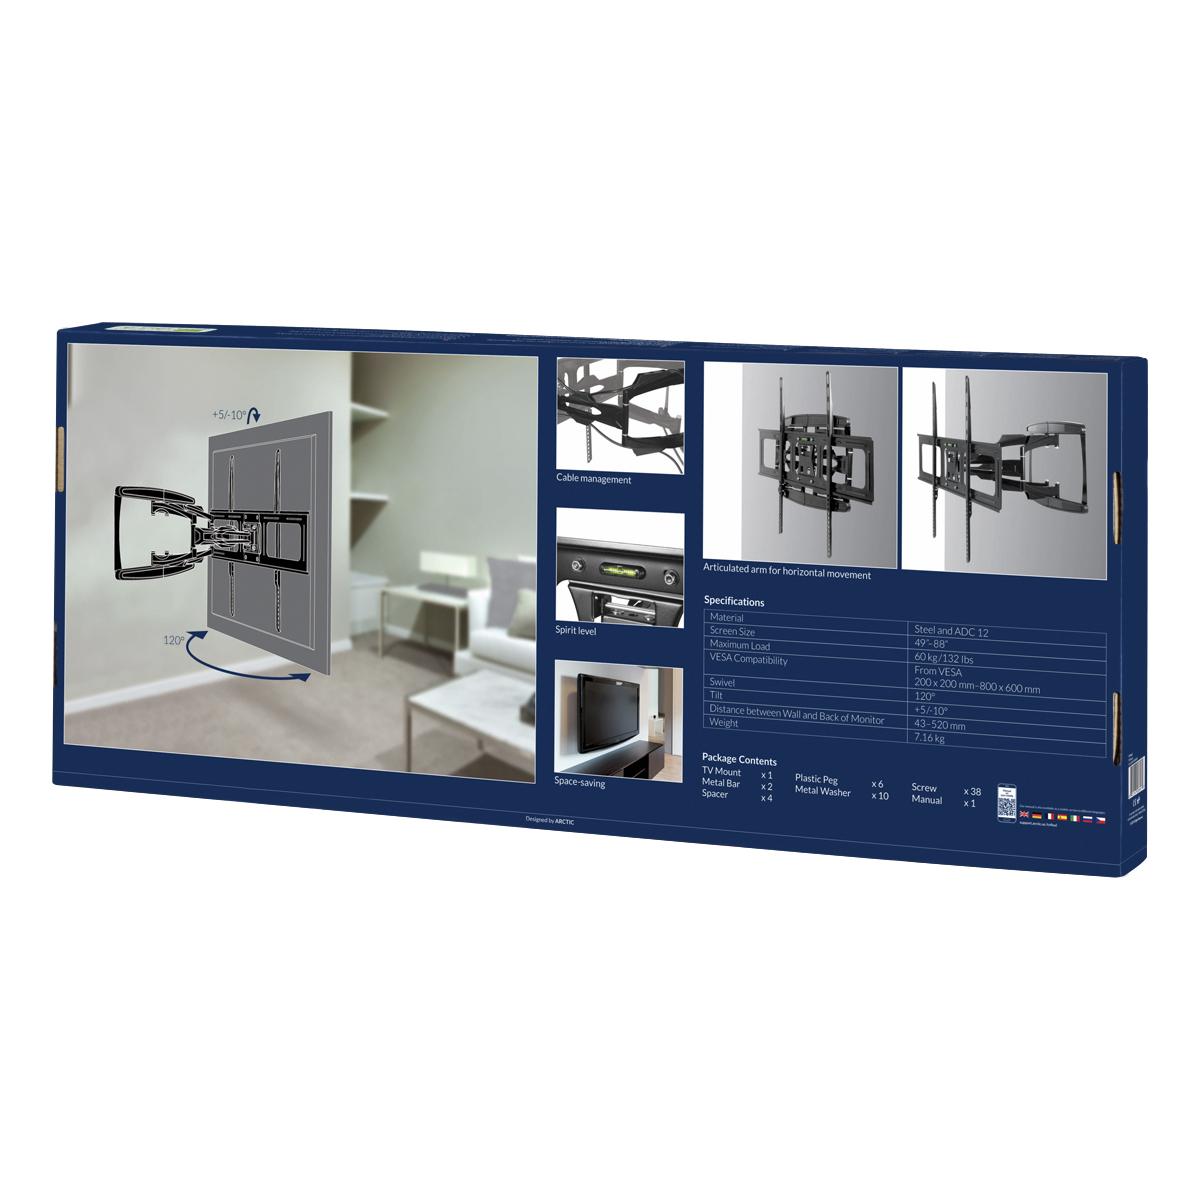 Suport profesional ARCTIC TV Flex L pentru televizor 49 - 88 inch, Unghi pivotant 120 grade, Inclinare suport: +5/-10°